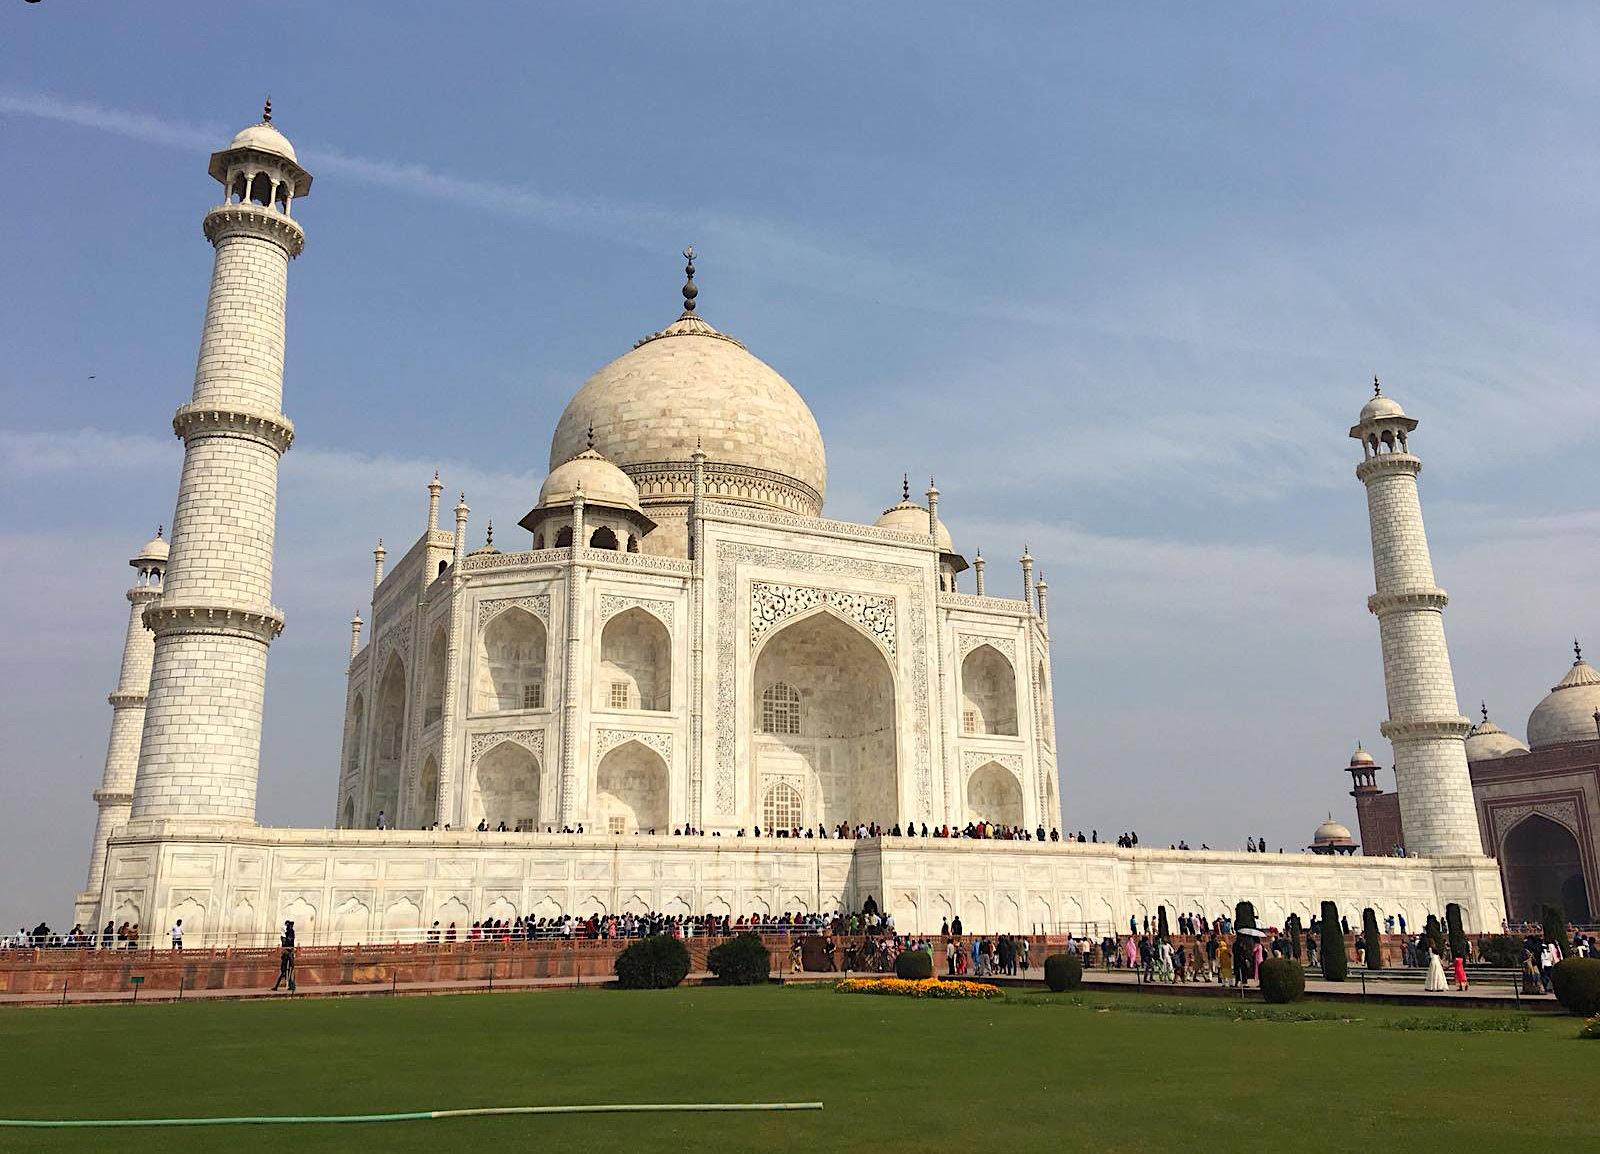 hindistanda gezilecek yerler - tac mahal